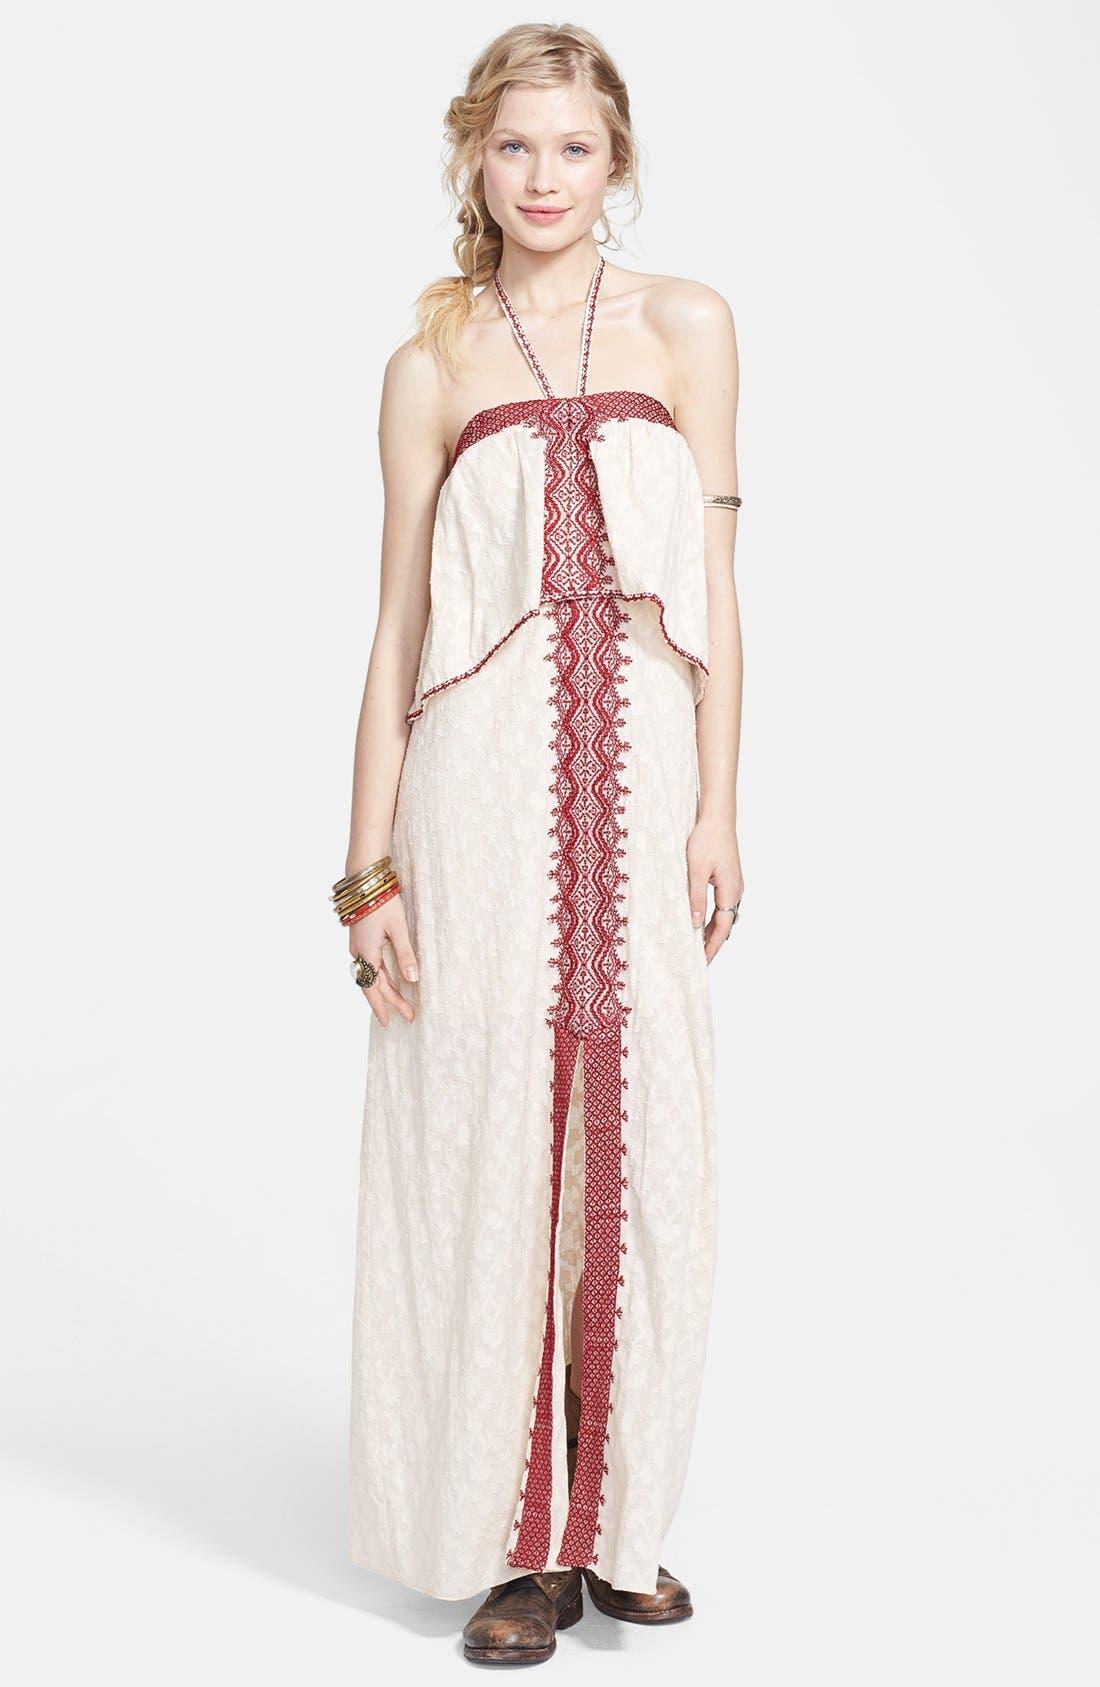 Main Image - Free People 'Marrakesh' Lace Trim Jacquard Halter Maxi Dress